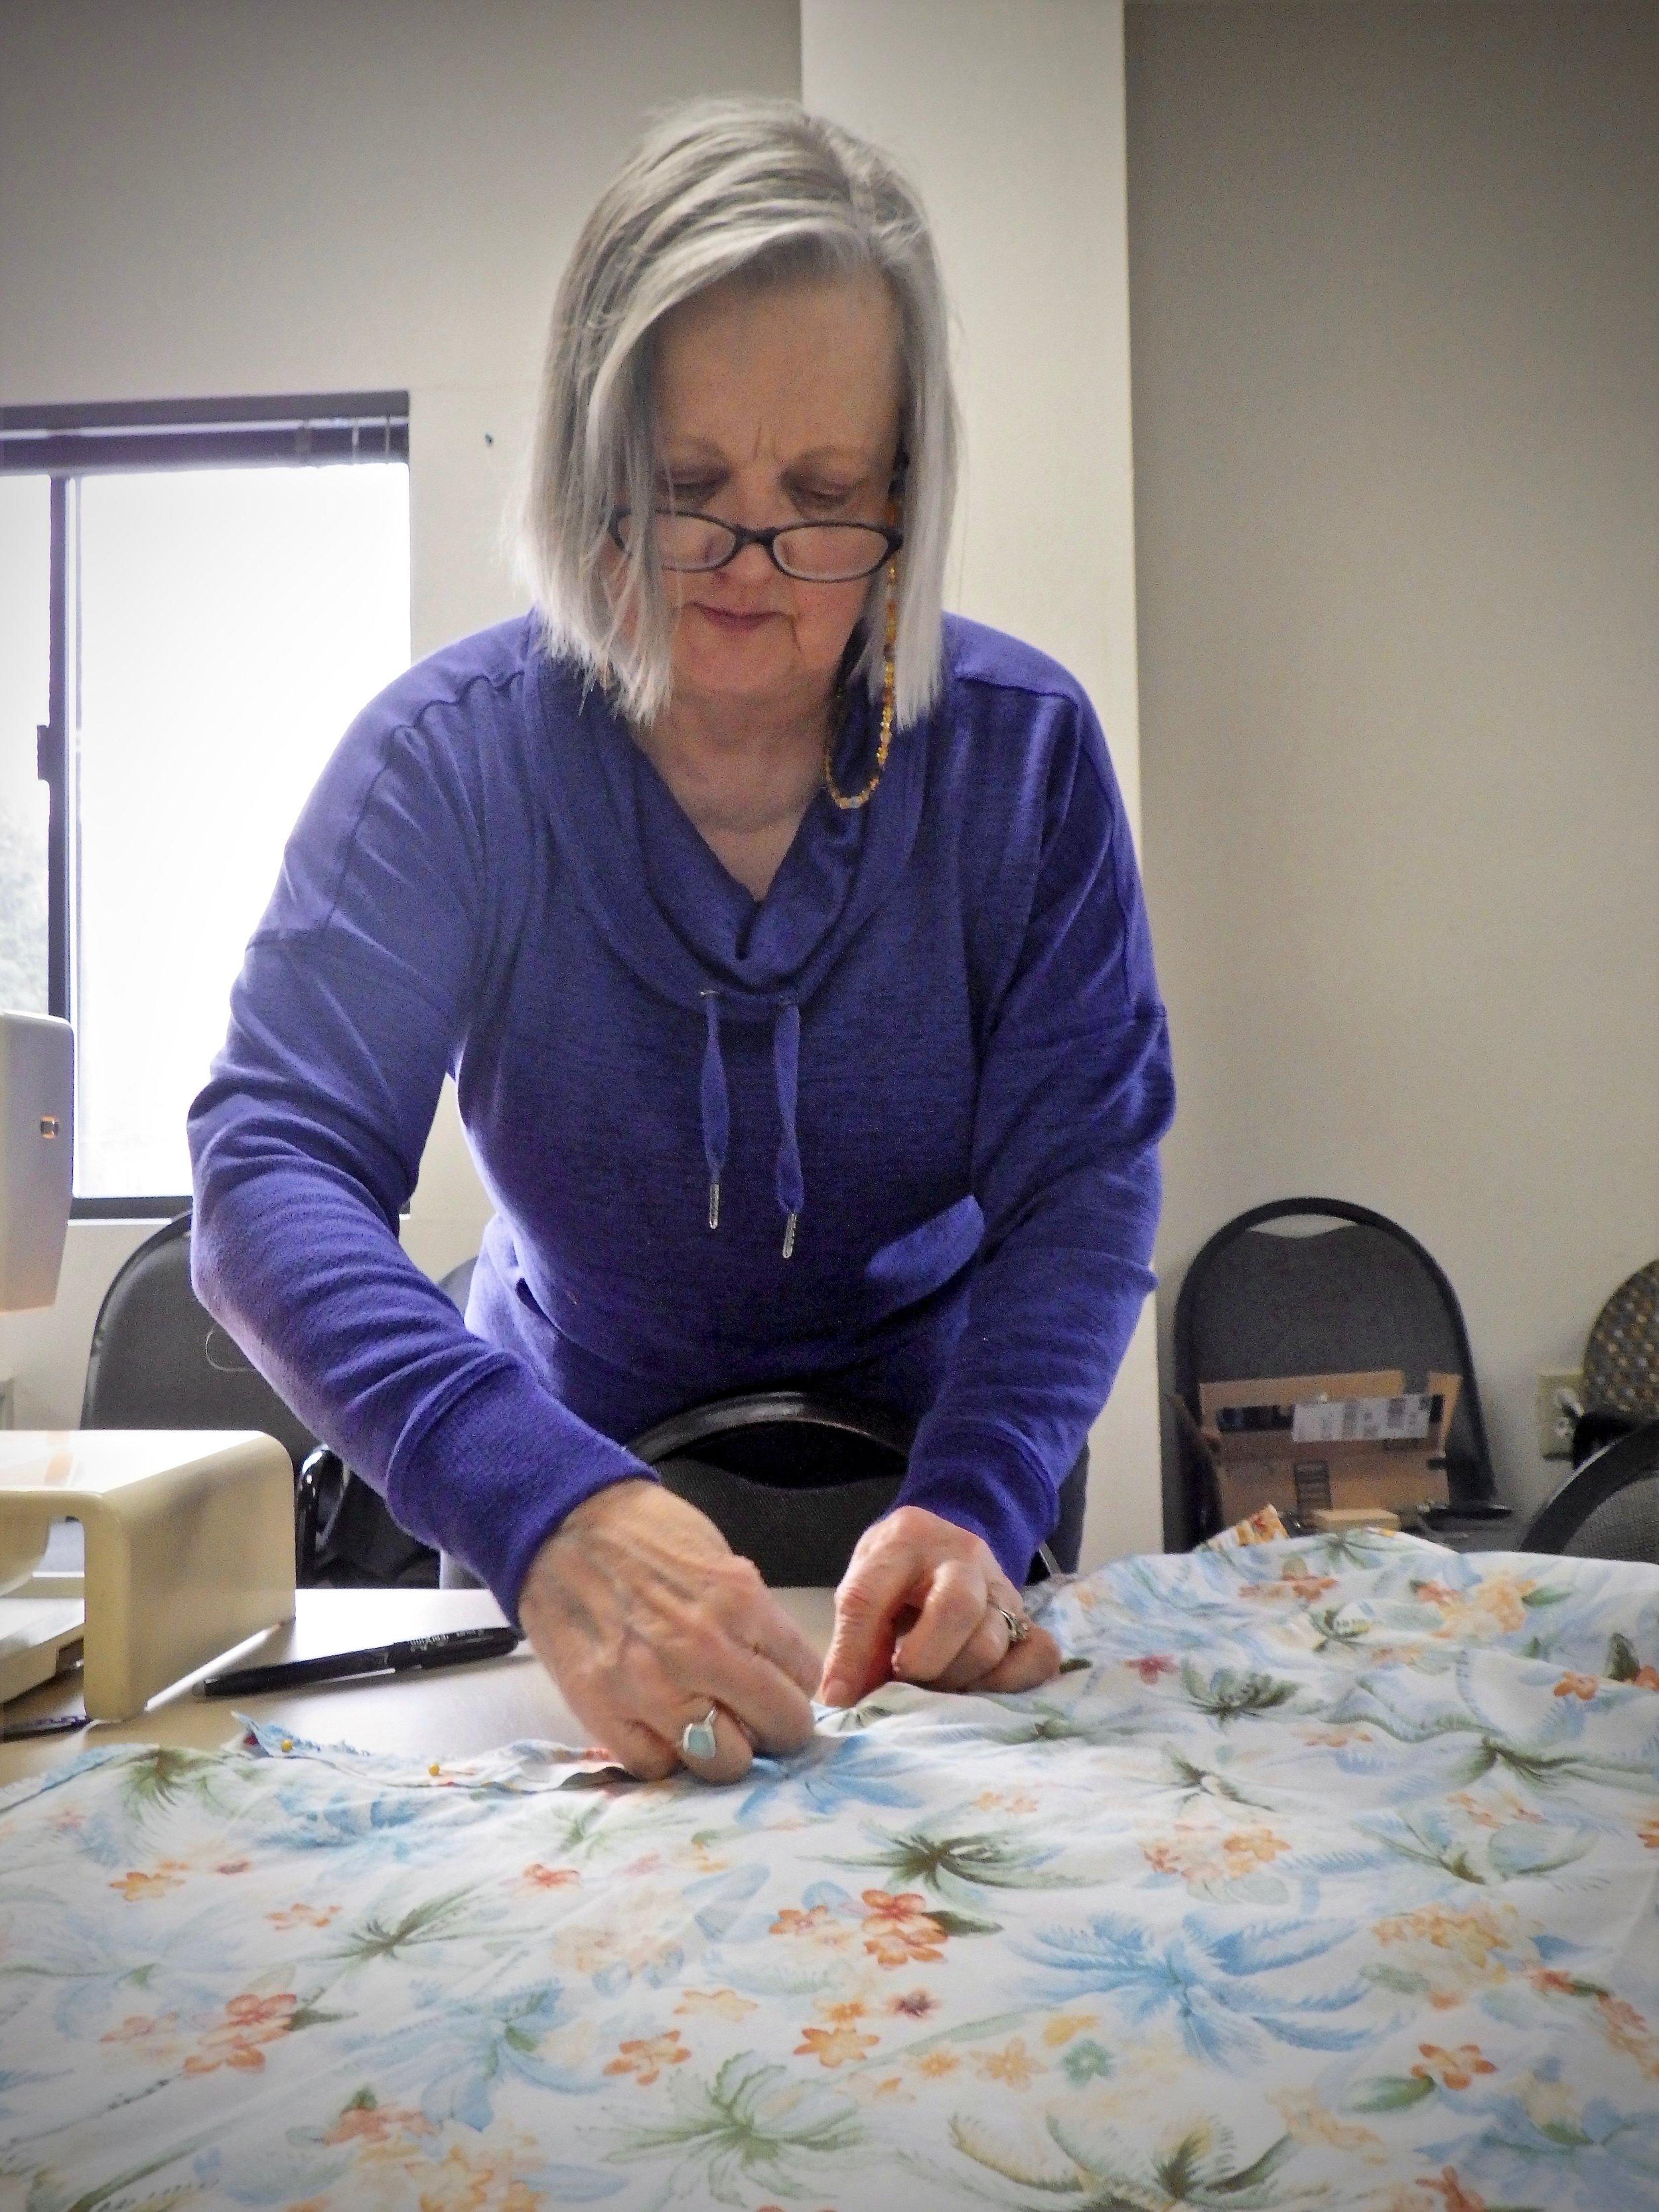 Julia mending clothing // Kate Bobal